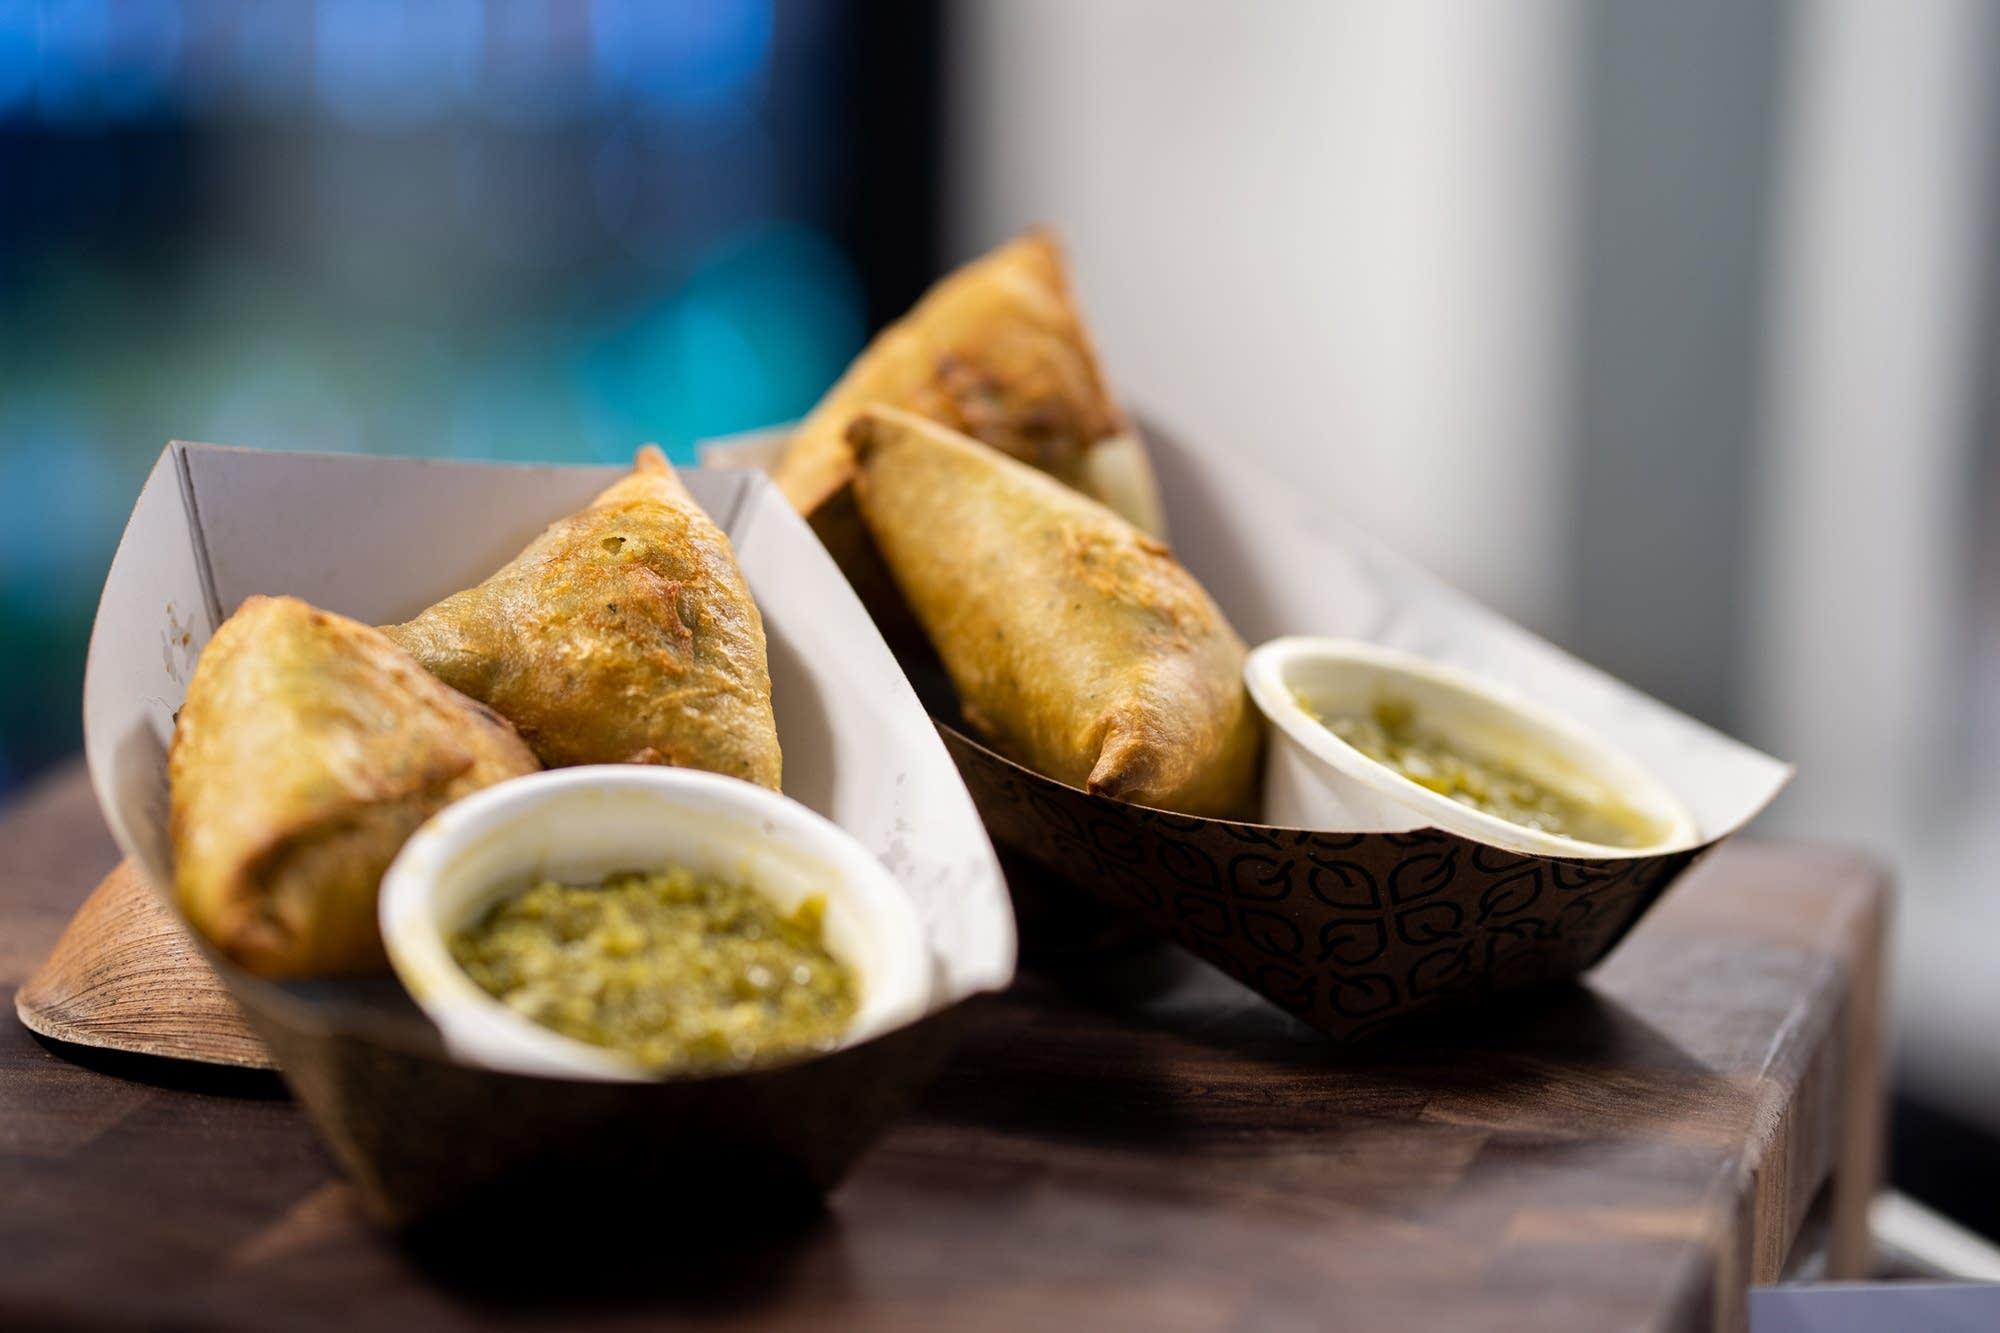 Afro Deli's veggie sambusas with green sauce.